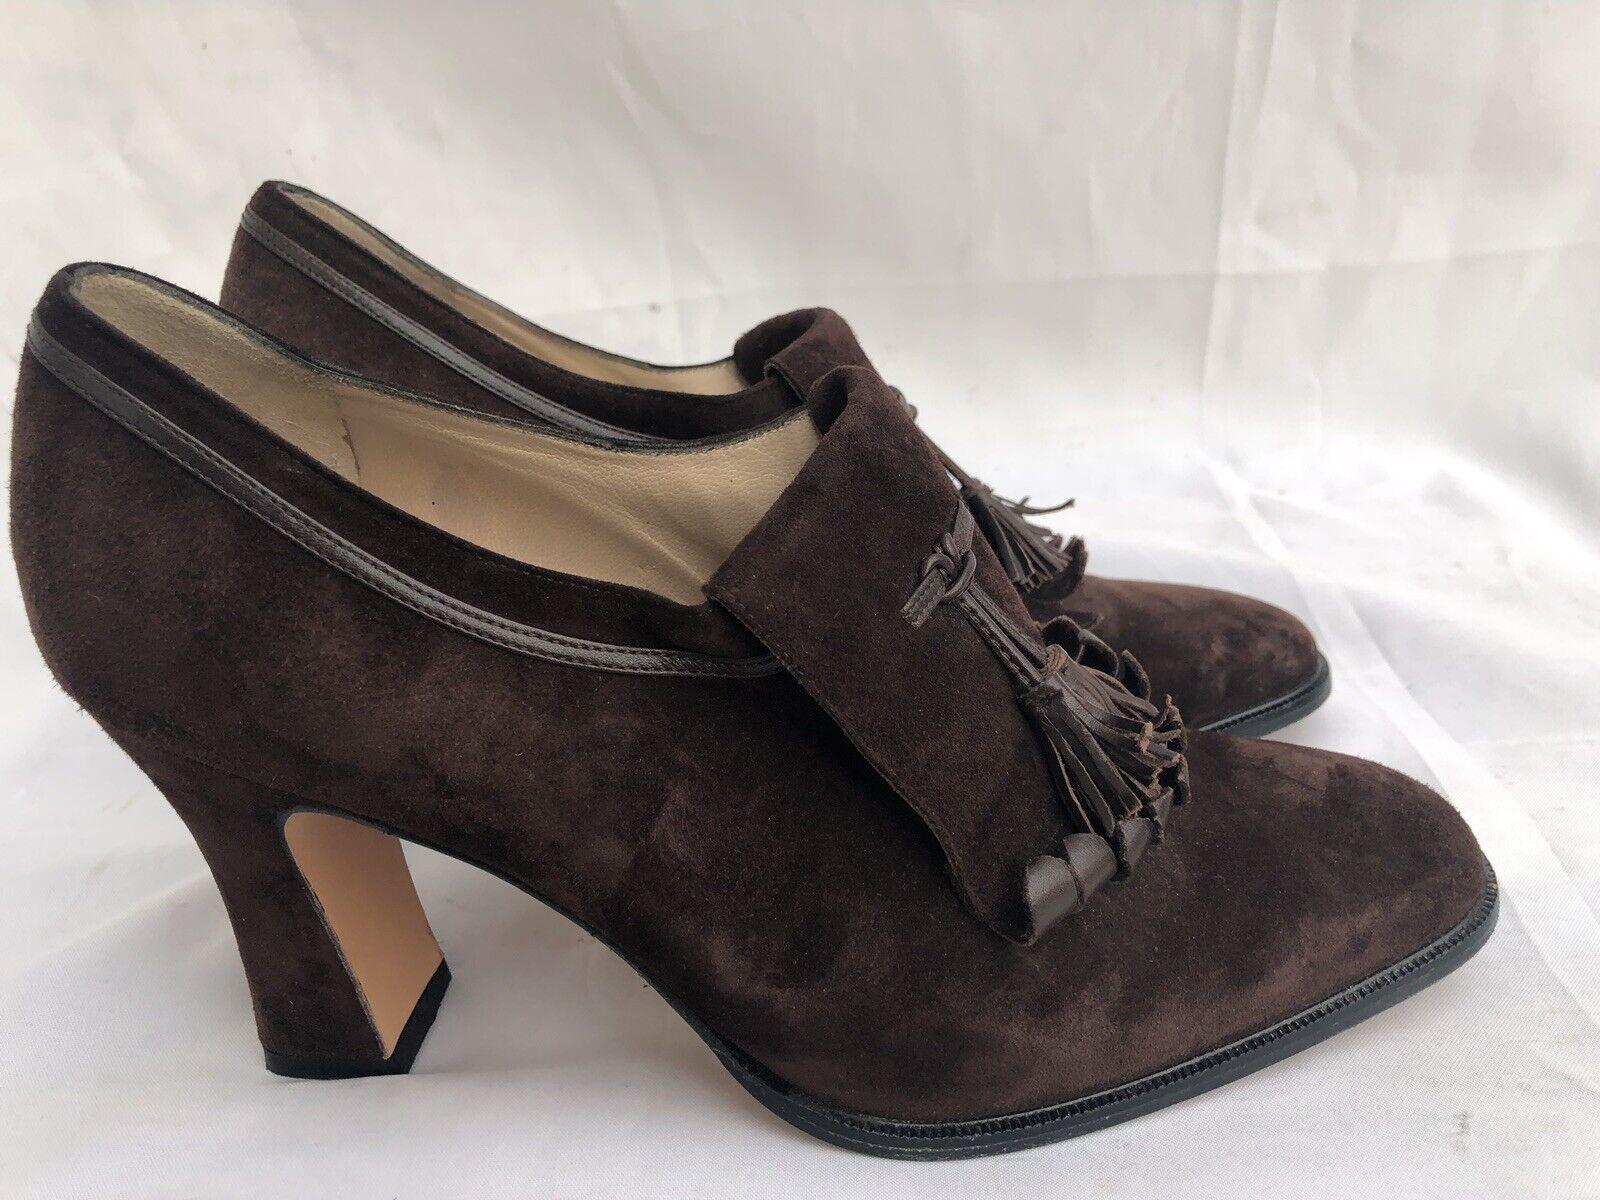 Salvatore Ferragamo Womans Suede W  Tossel Fridge Ankle Boots Louis Heel Brown 6